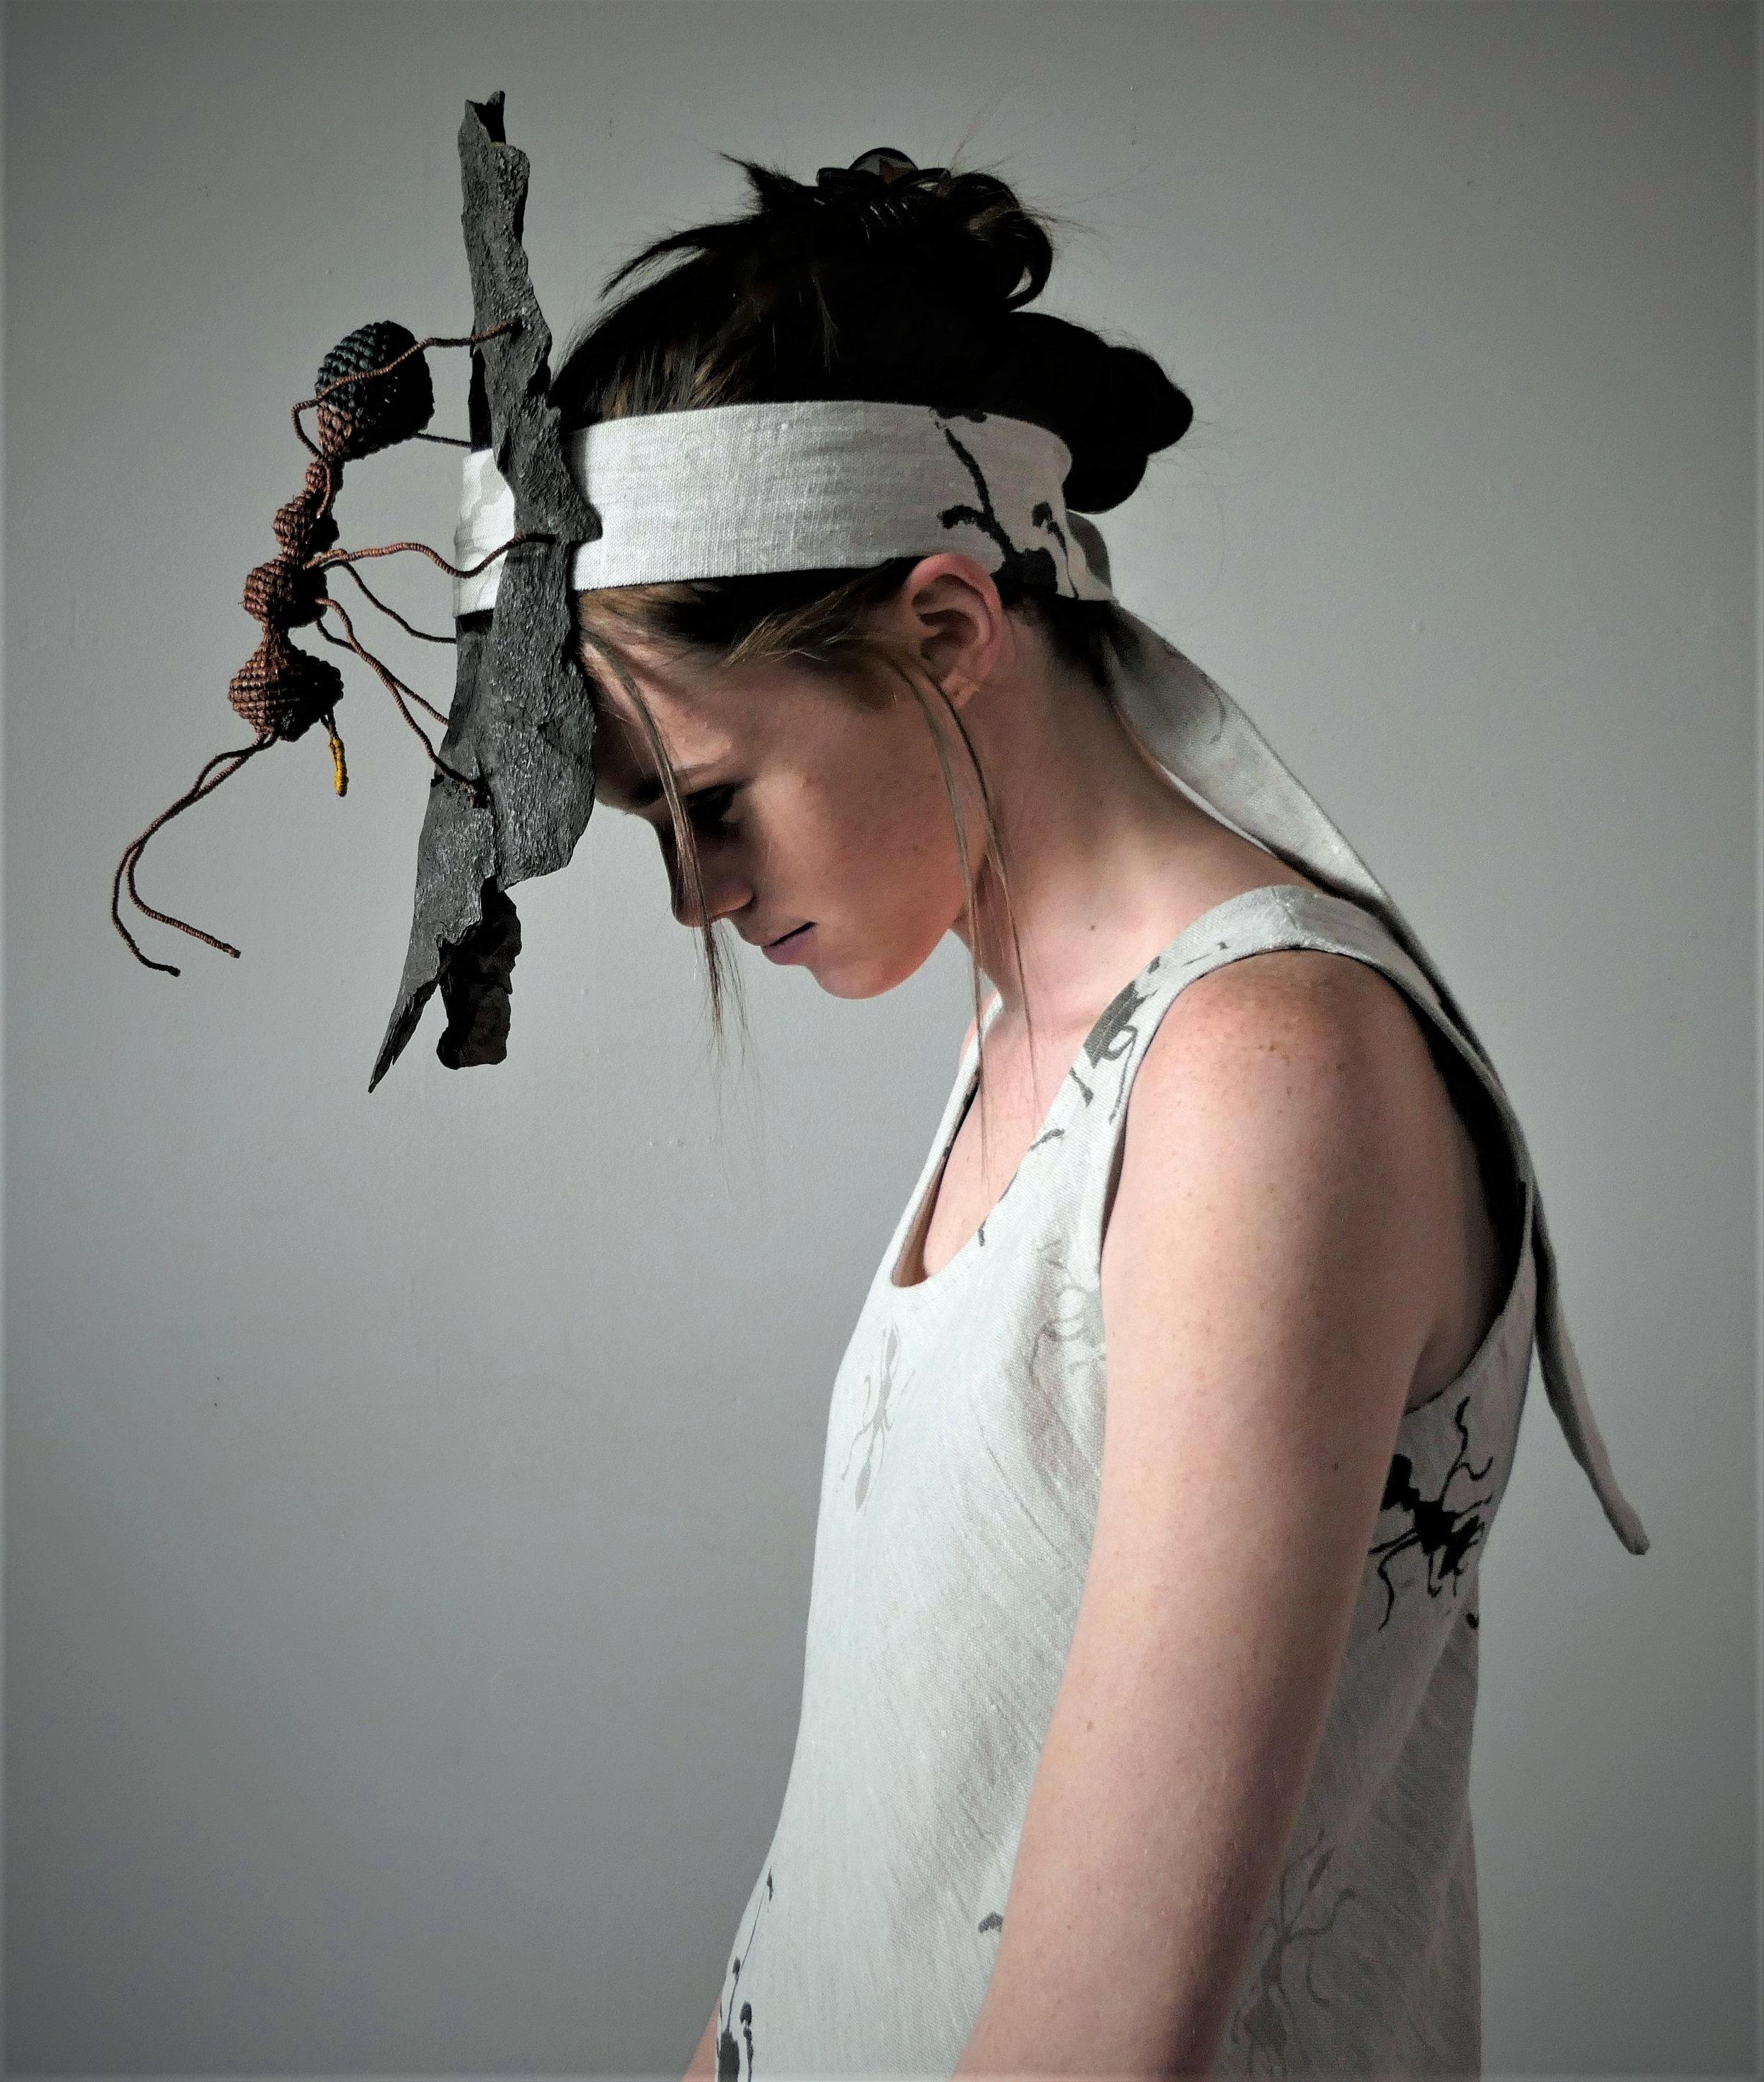 - Designer | Wendy CrowArt Centre | Kaiela Arts SheppartonCollection Name | Yurri Wala Kaiela – Fresh Water River